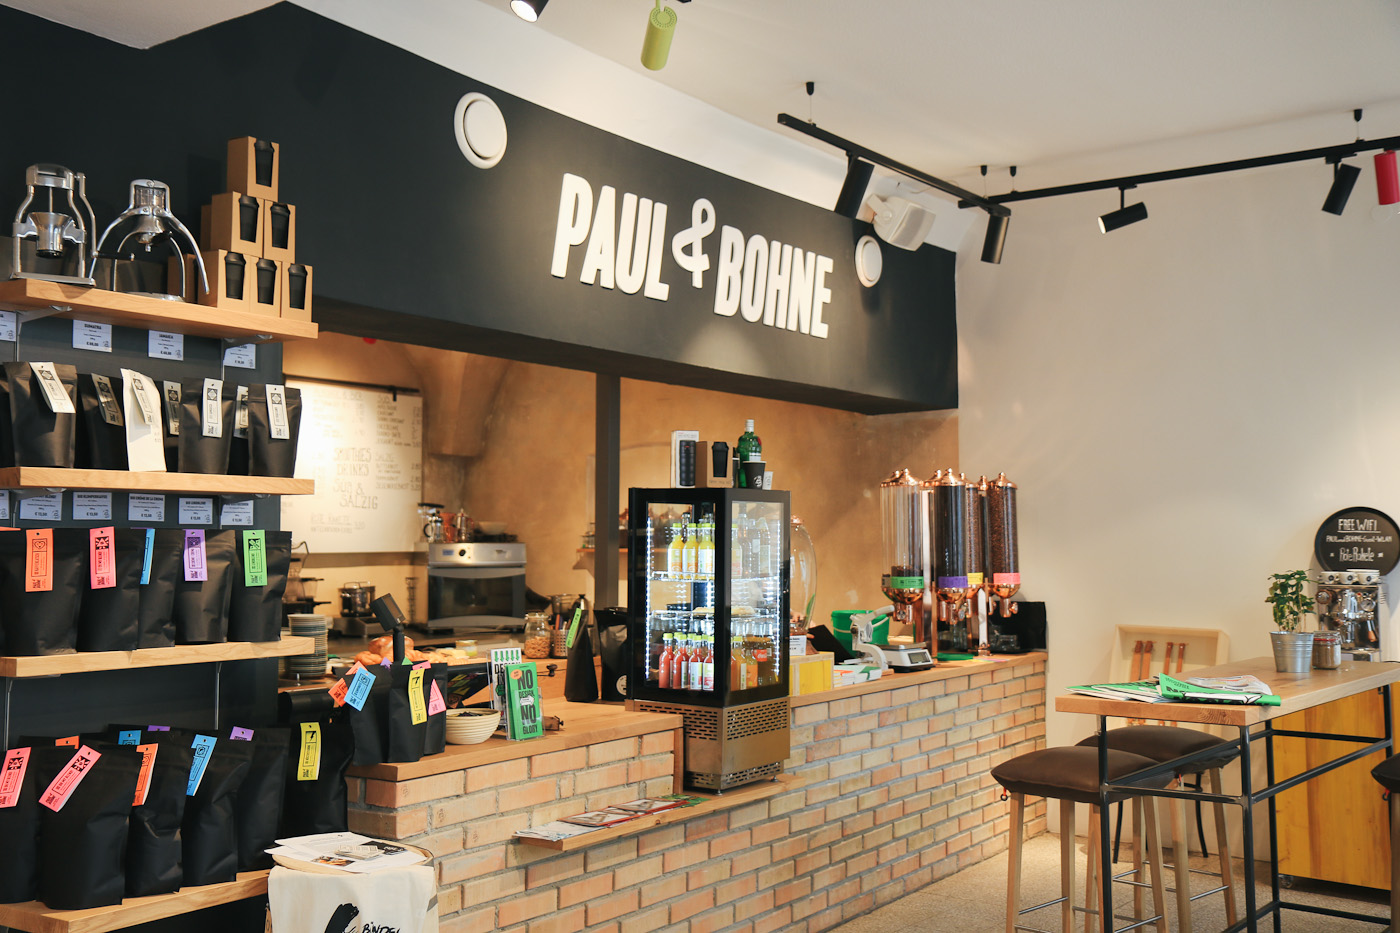 Paul&Bohne graz Kaffeerösterei